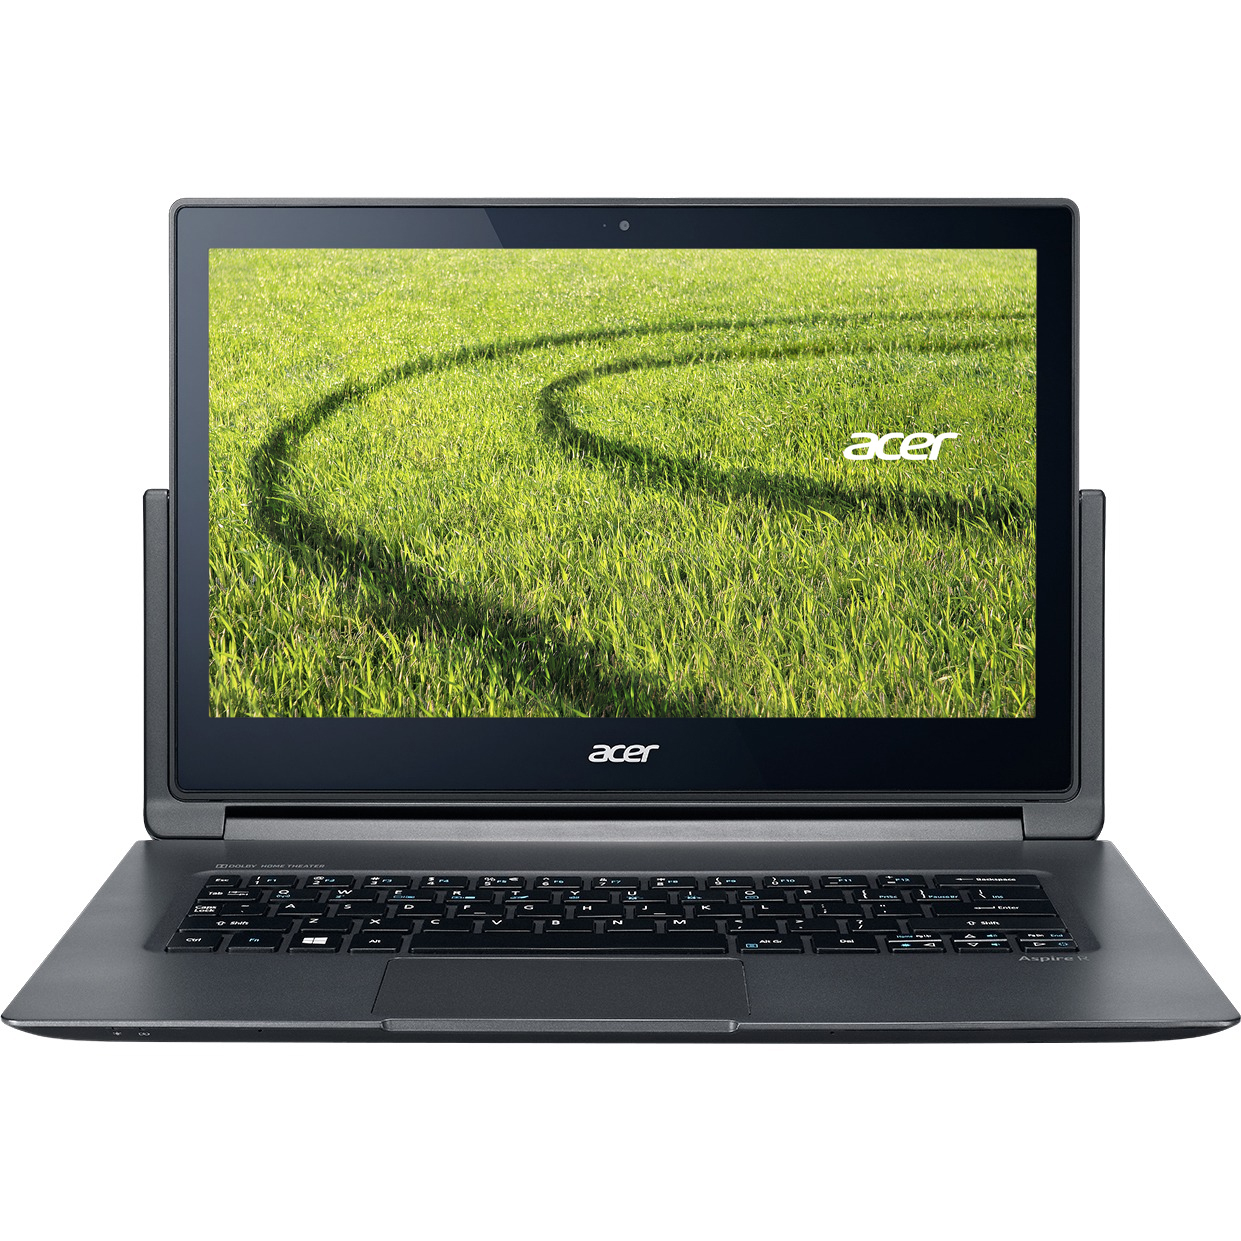 "Acer 13.3"" Intel Core i7 2.40 GHz 8 GB Ram 512 GB SSD Win..."